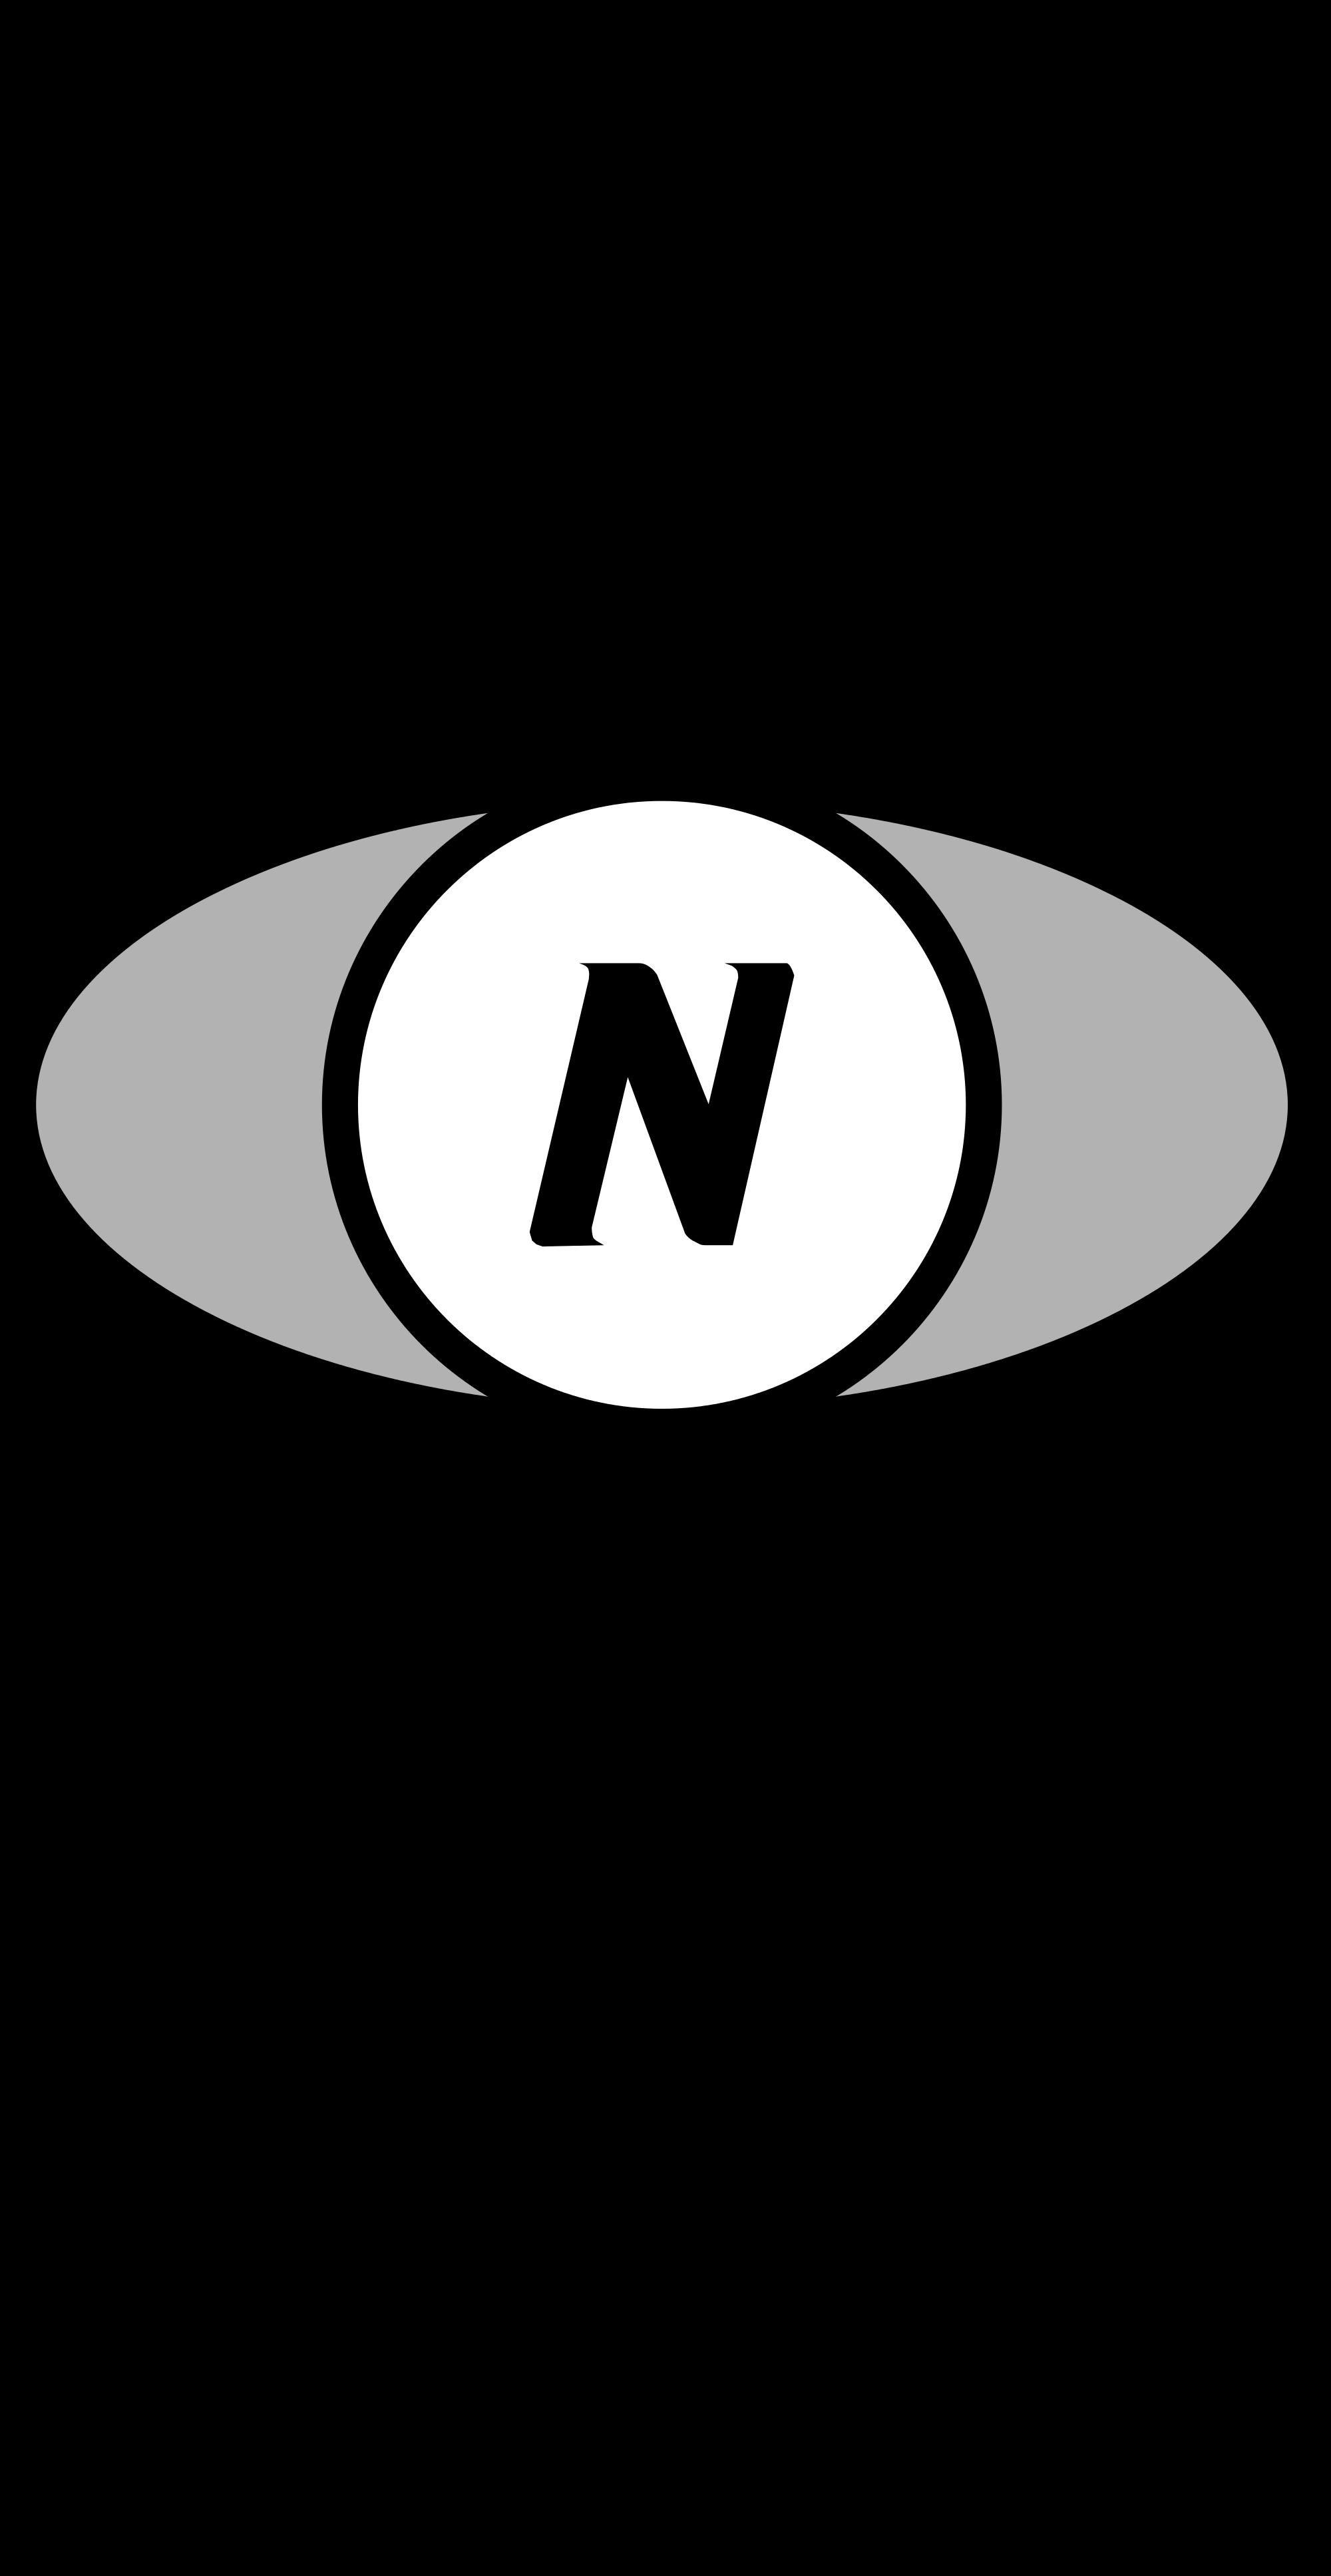 North Element www.dpls .ir 37 - دانلود ۵۰ مدل علامت شمال png برای استفاده در شیت بندی